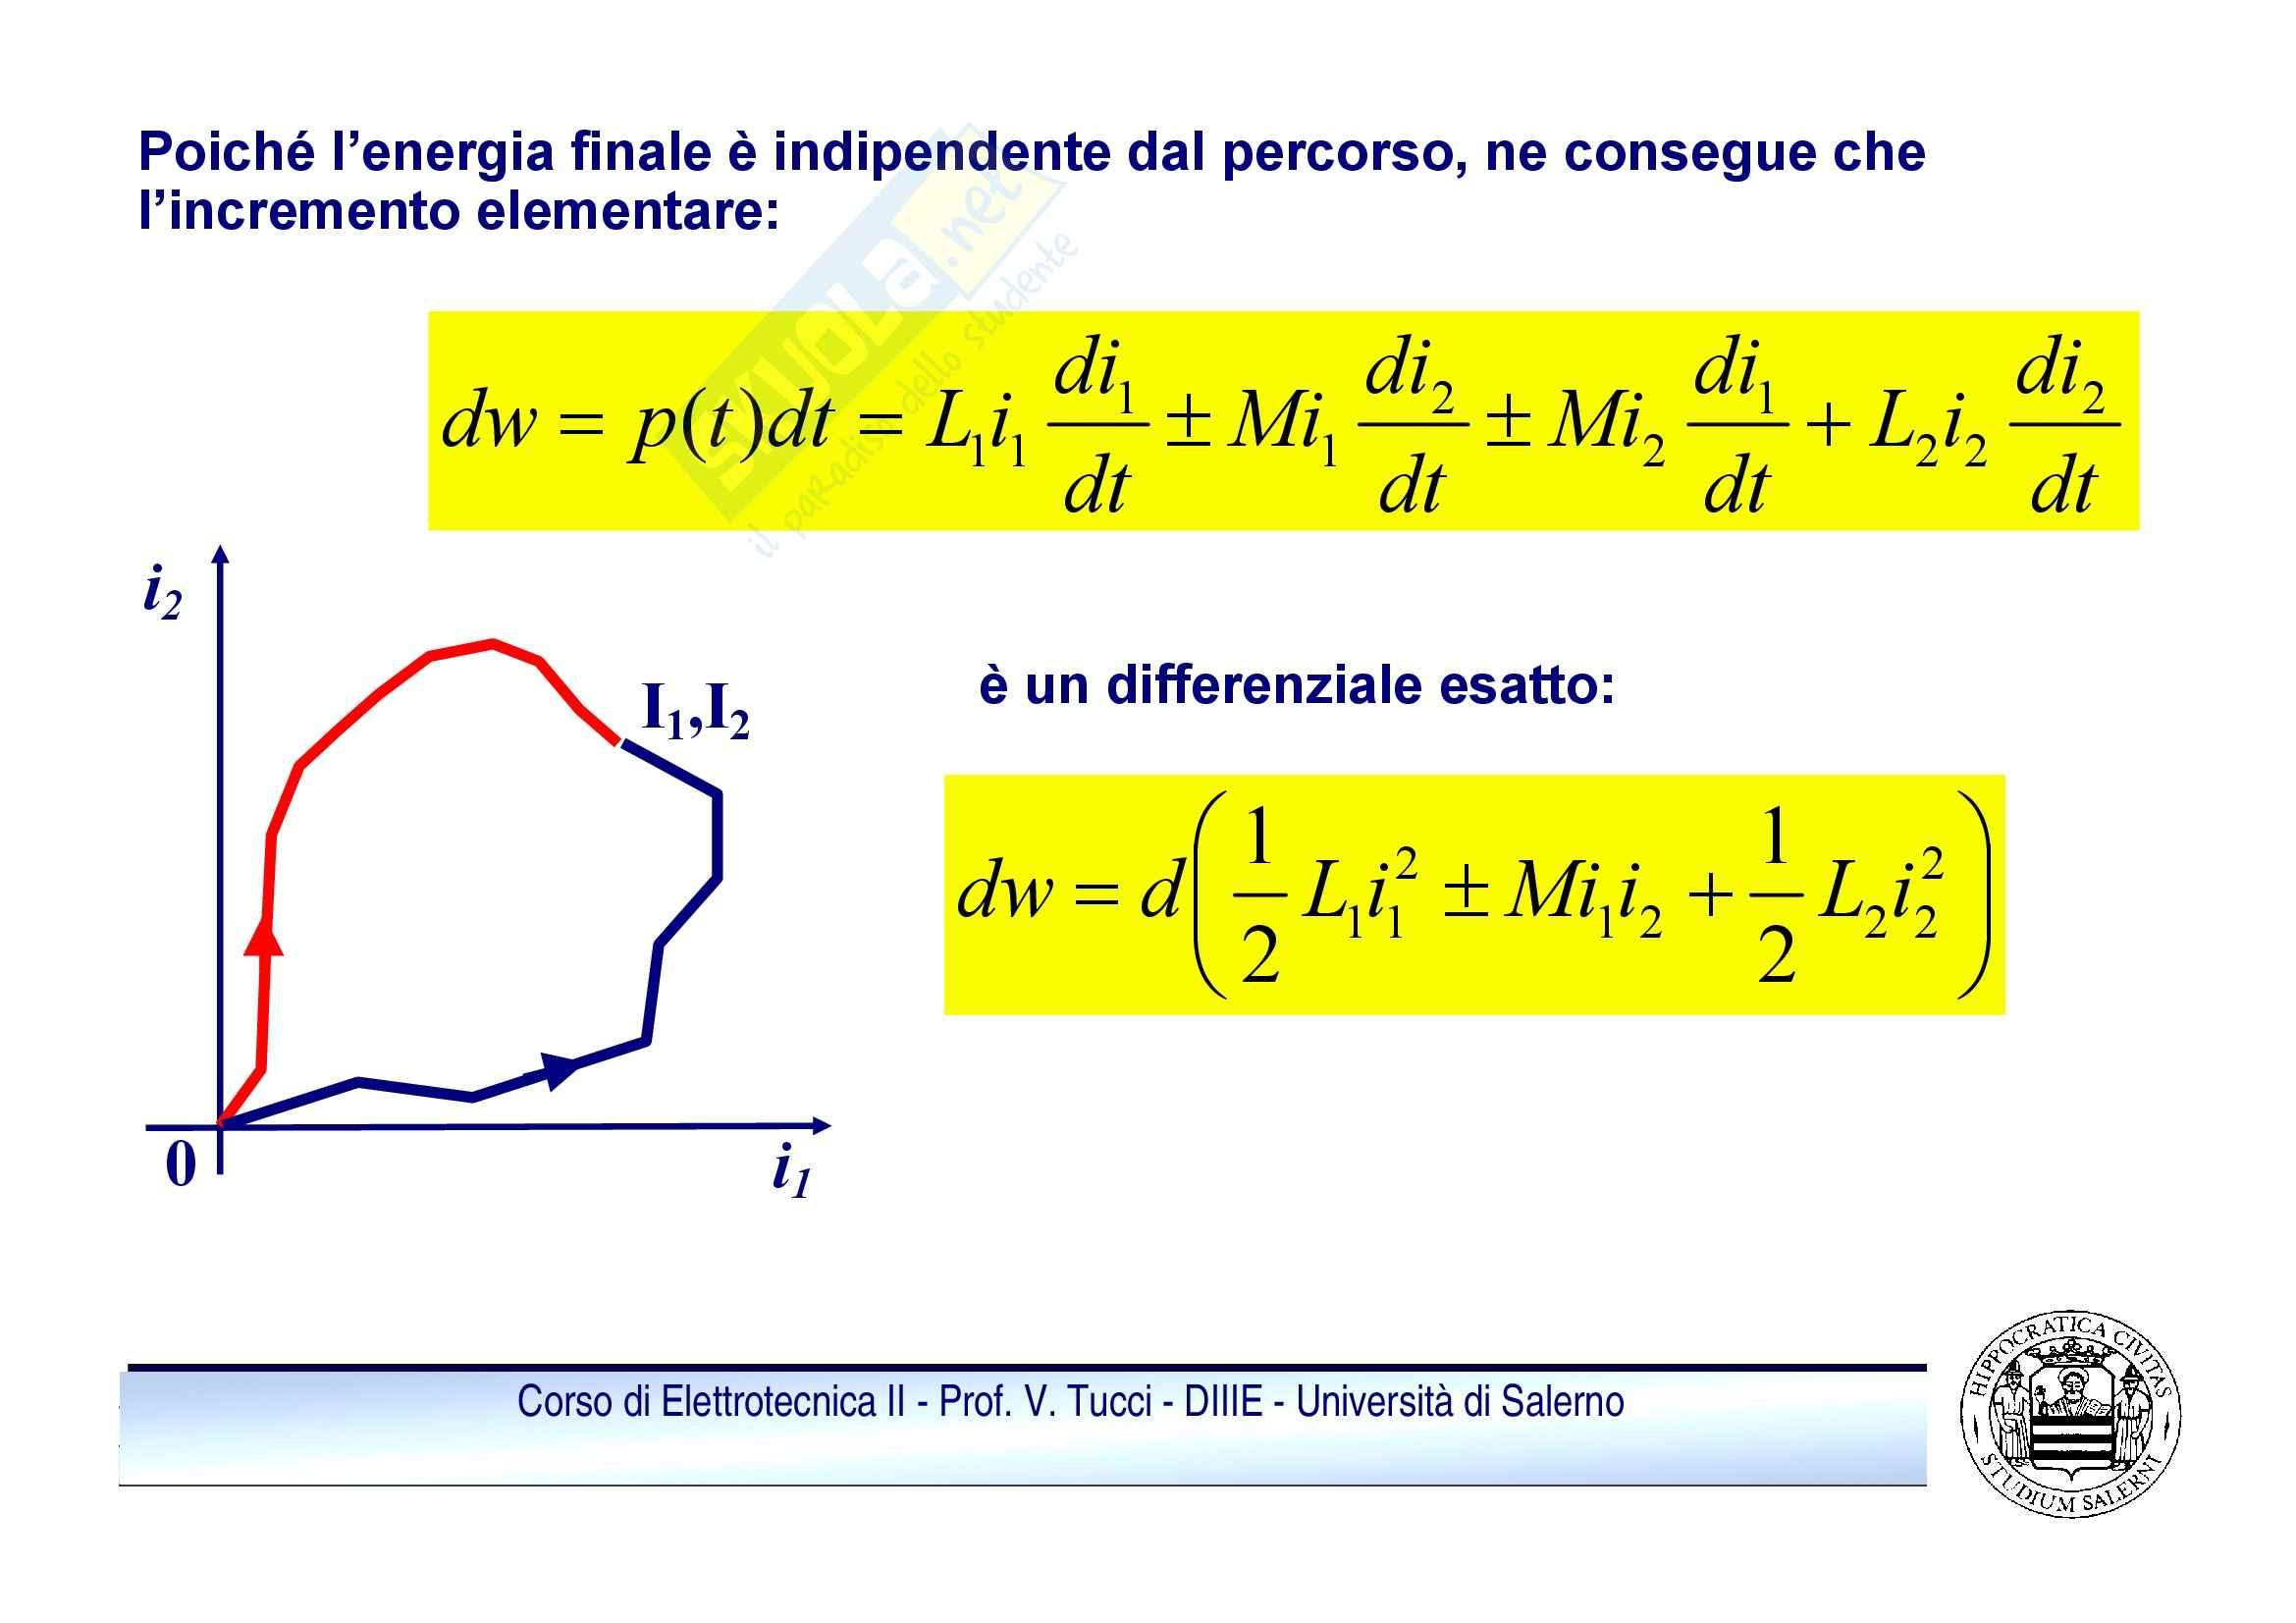 Doppi bipoli - regime sinusoidale Pag. 41